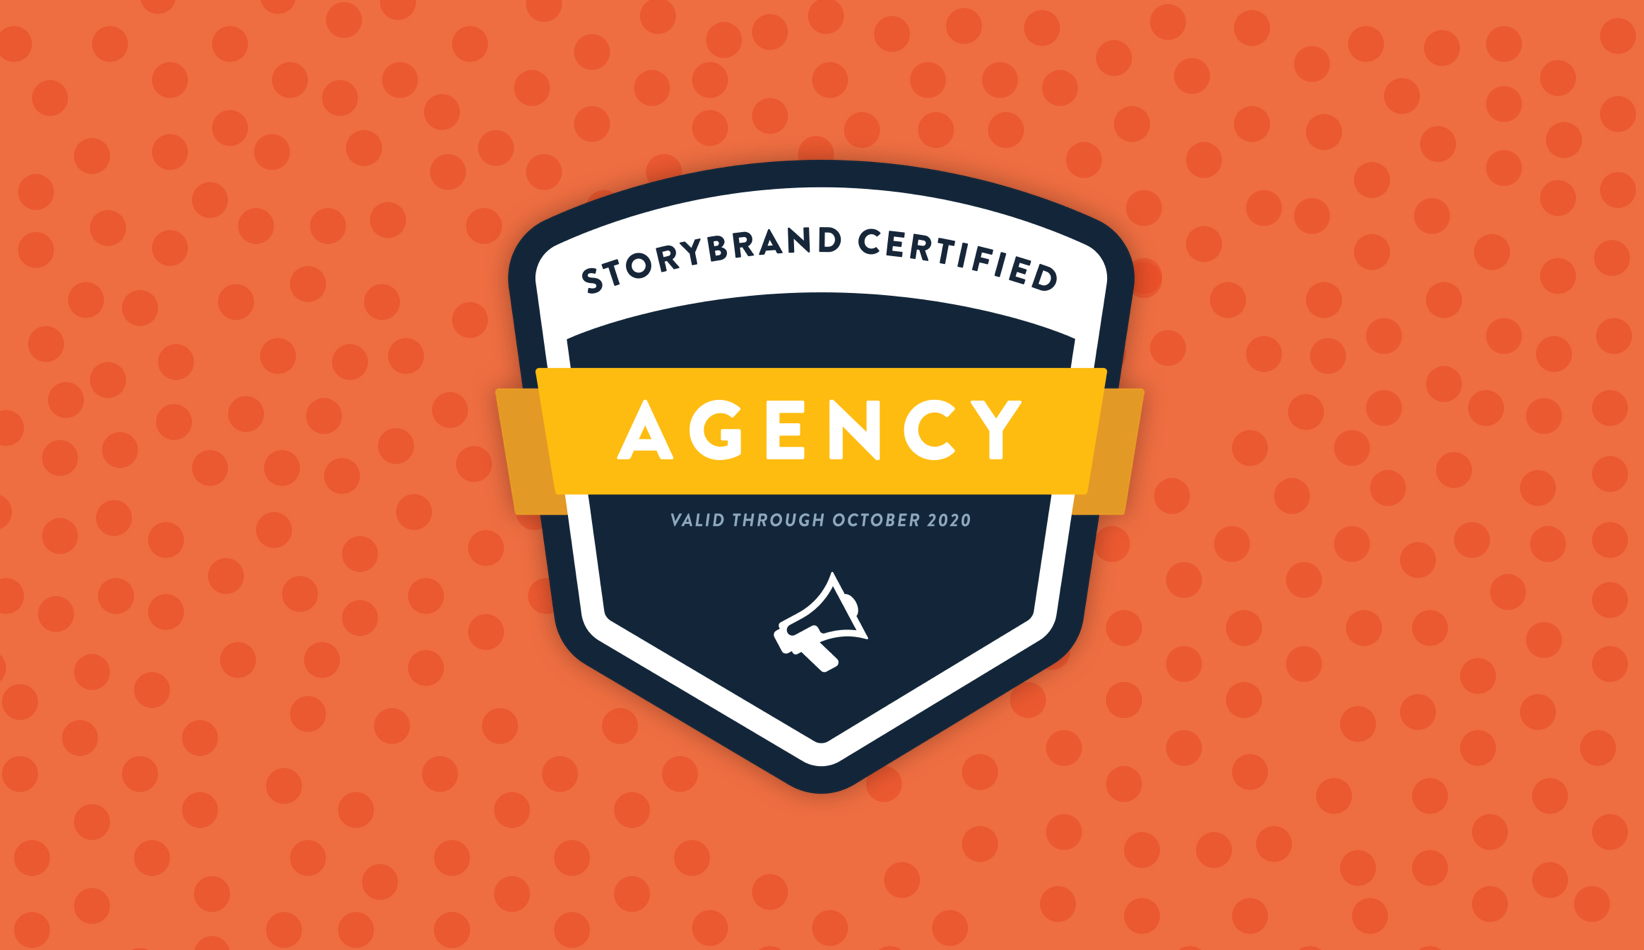 USDP Storybrand certified agency